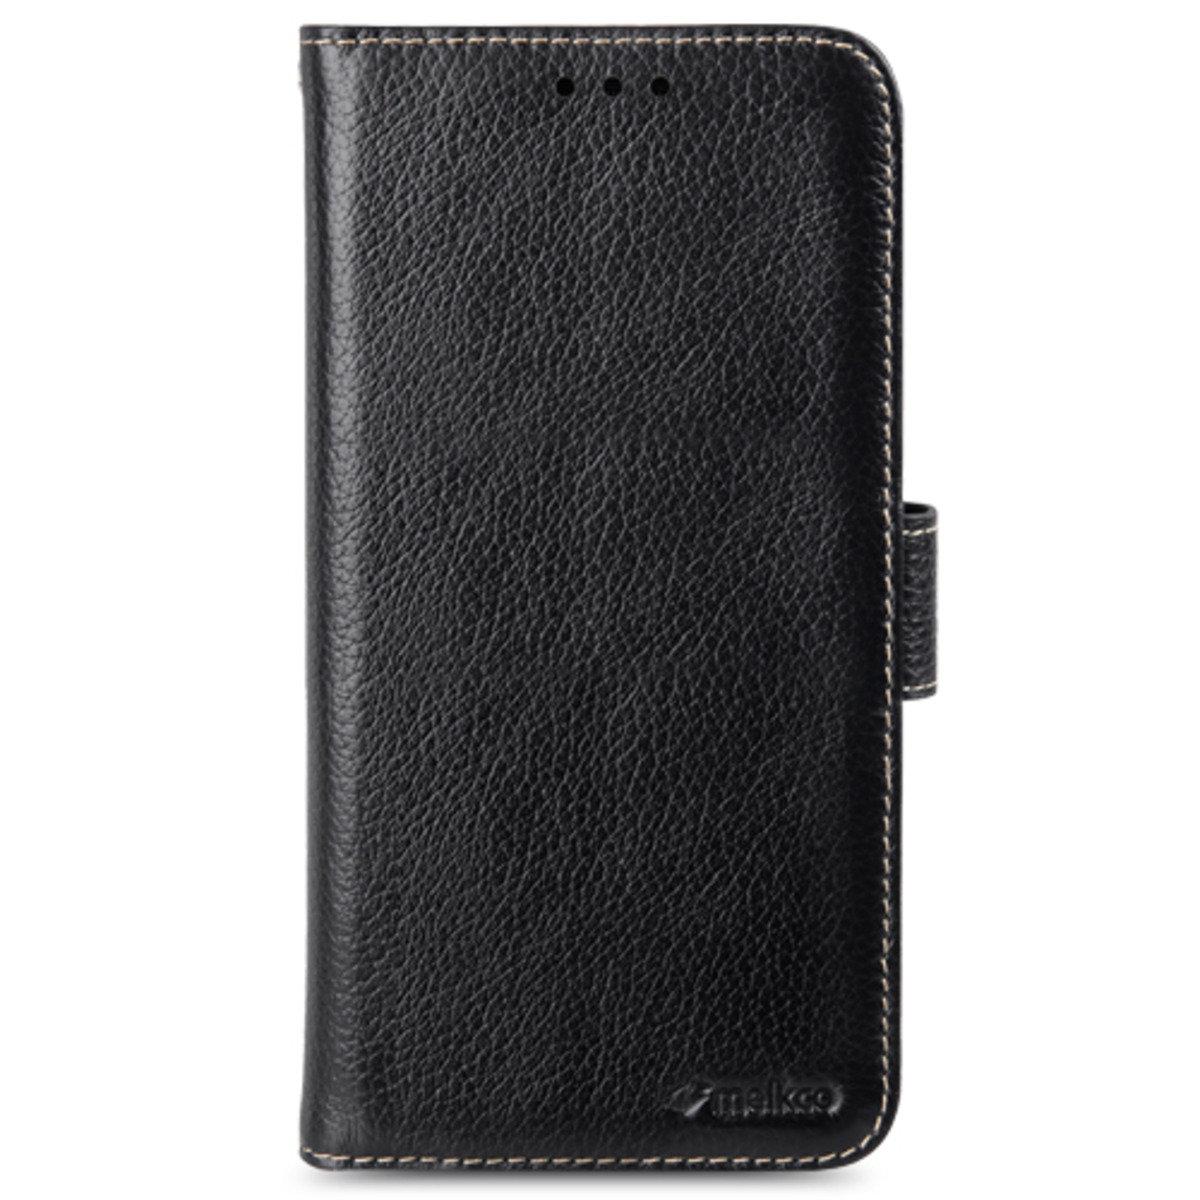 Samsung Galaxy A8 Wallet Book Type 高級真皮革手機套 - 黑色荔枝紋